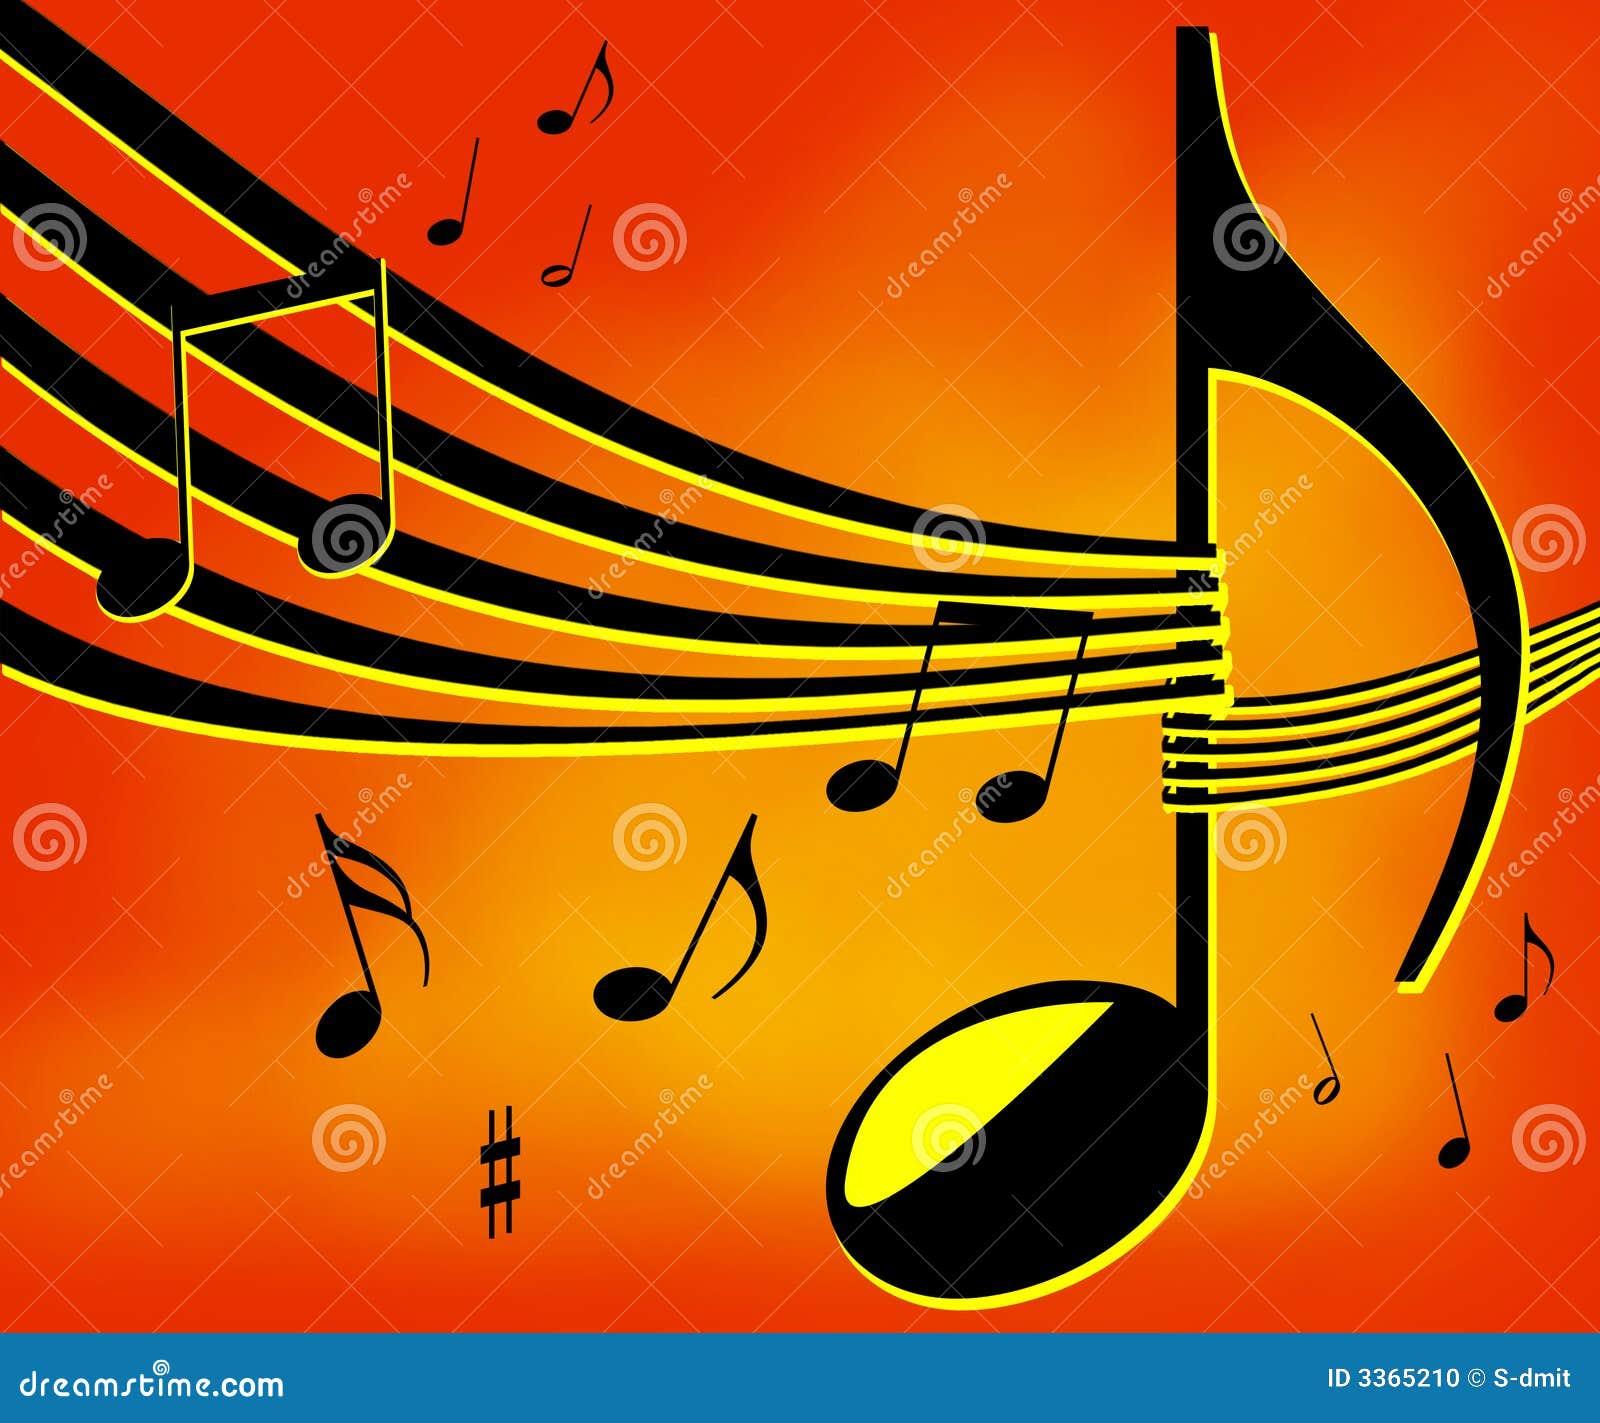 Music notes background stock illustration. Illustration of ...